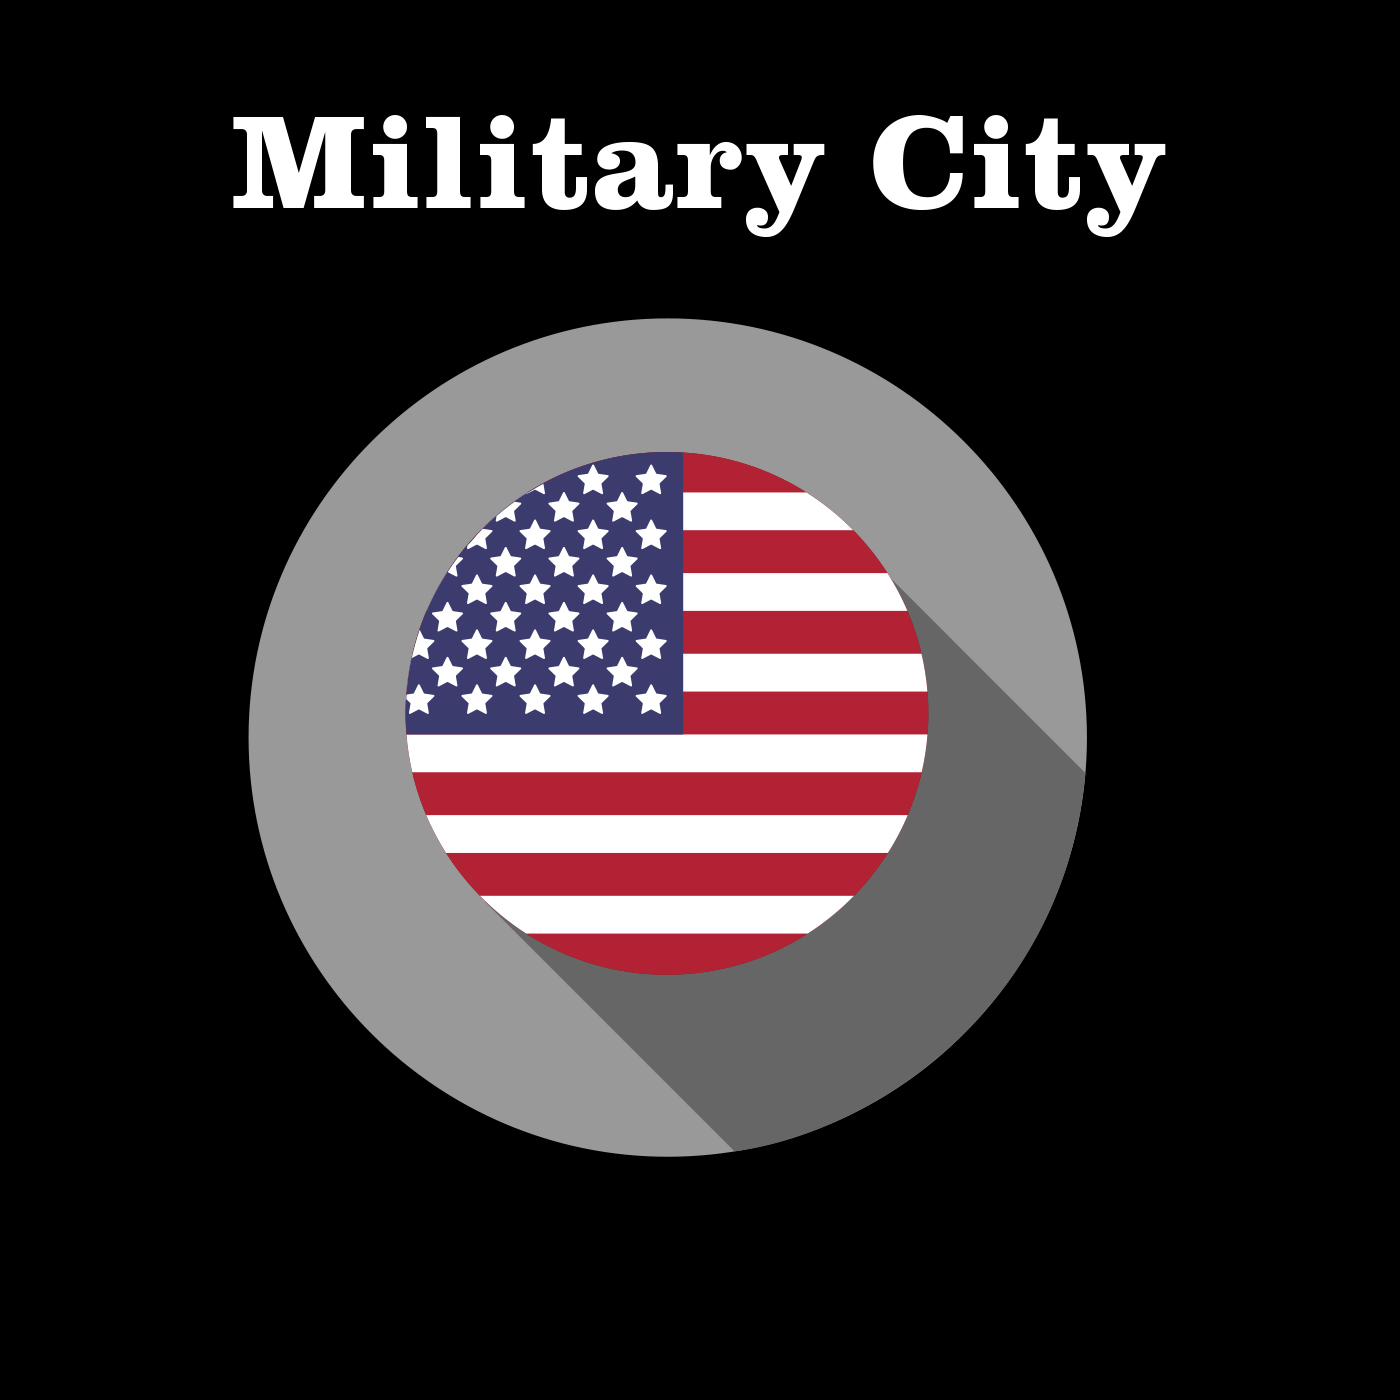 Military City